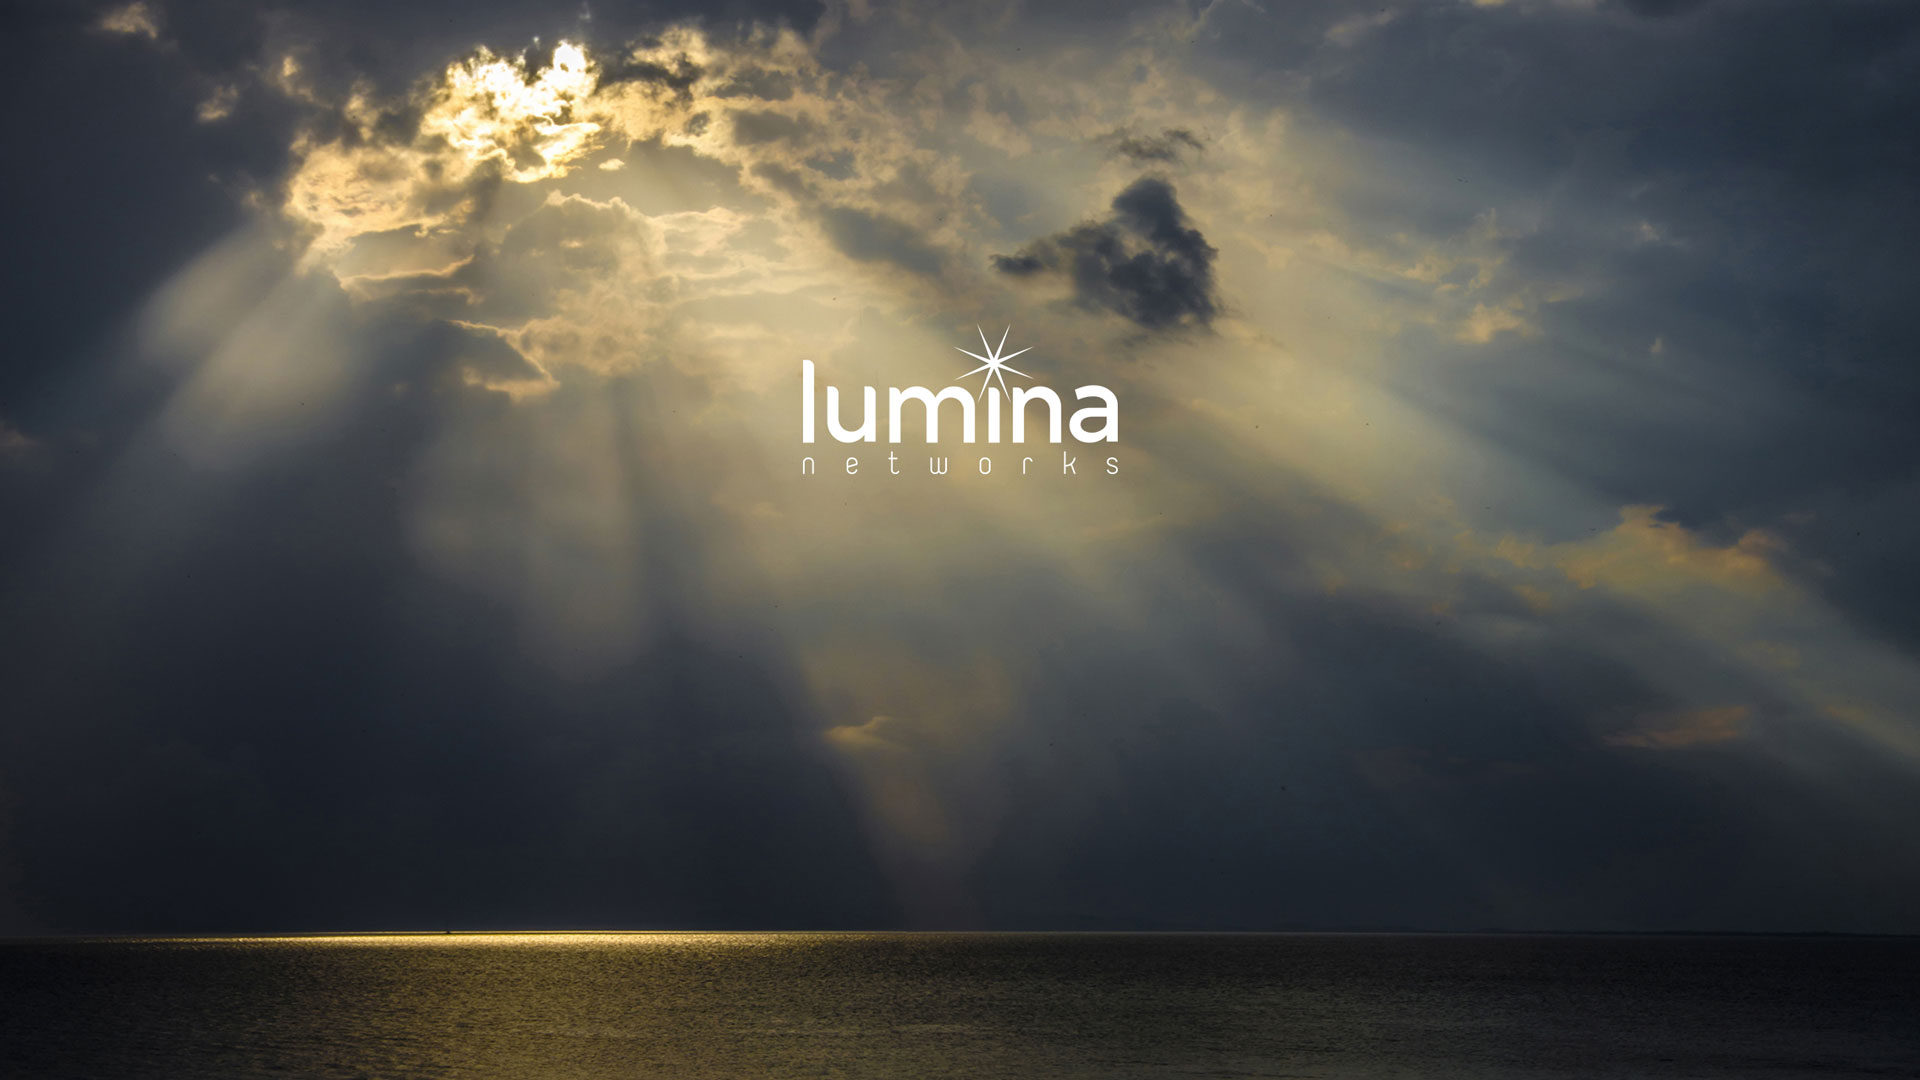 Lumina press & content strategy